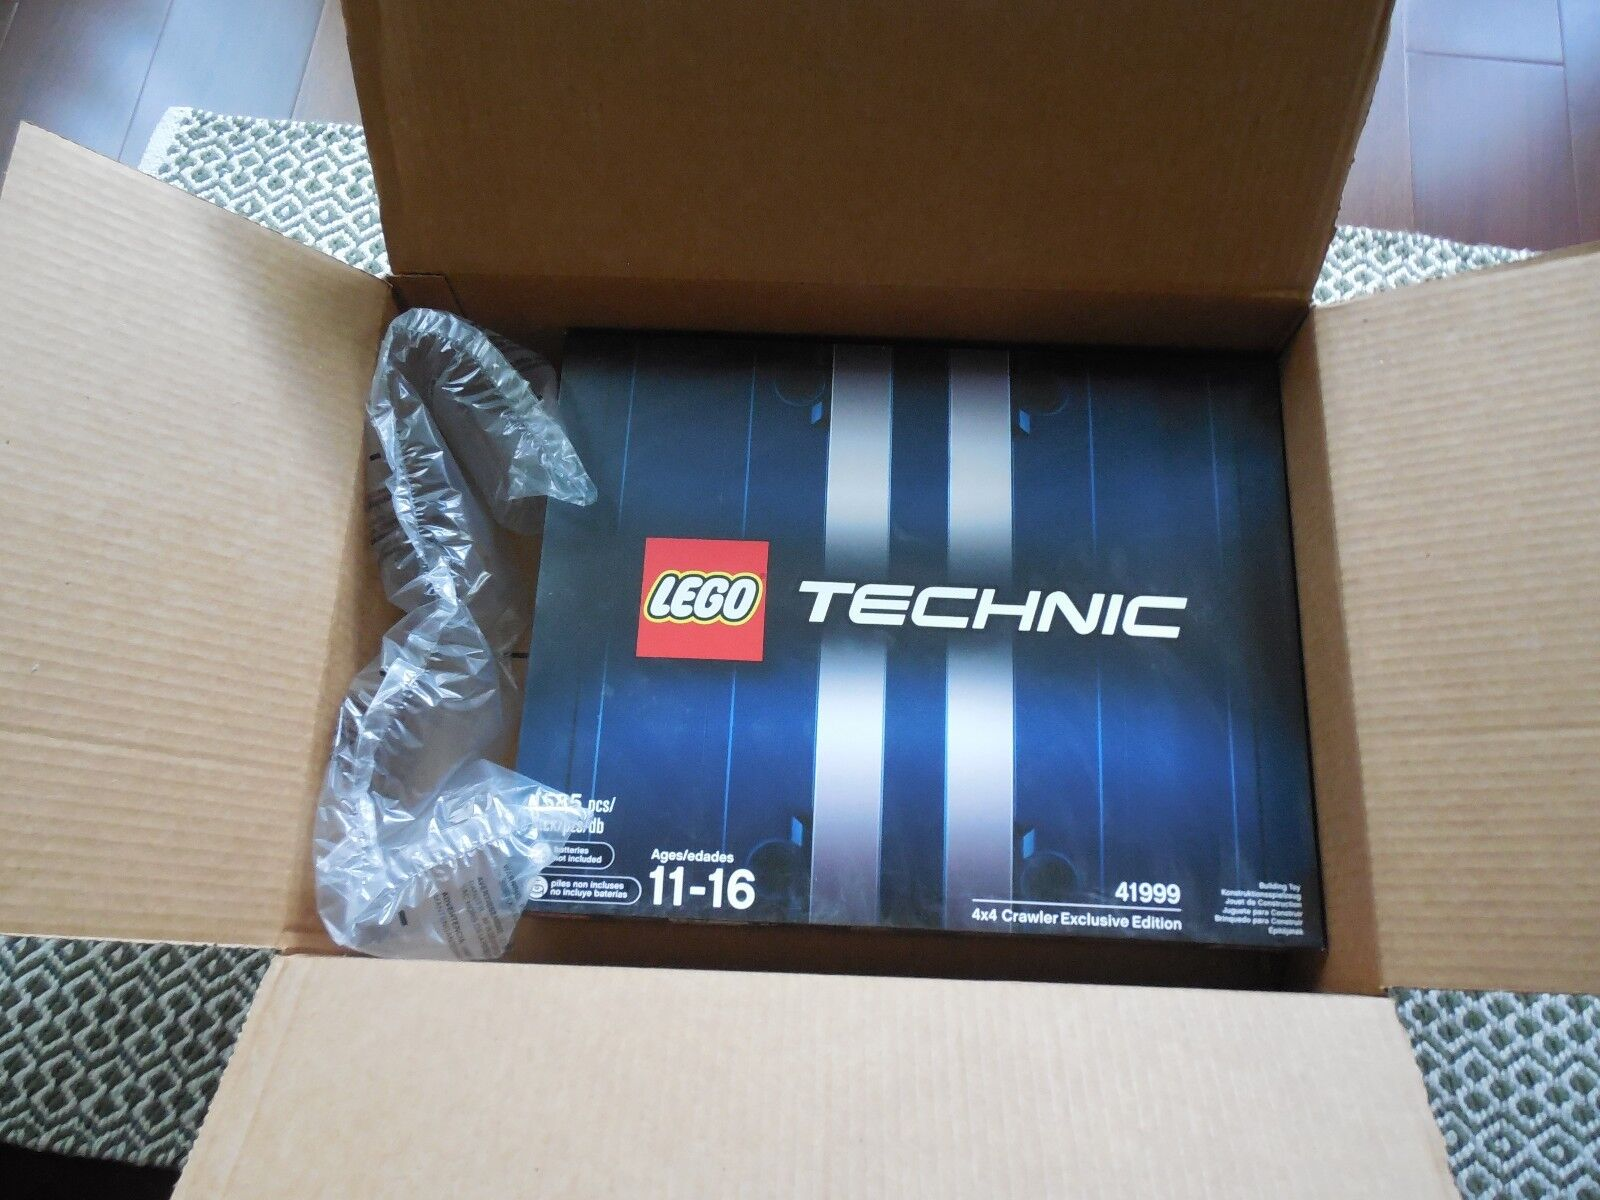 LEGO Set 41999 Technic 4x4 Crawler Exclusive Edition Retired BRAND NEW